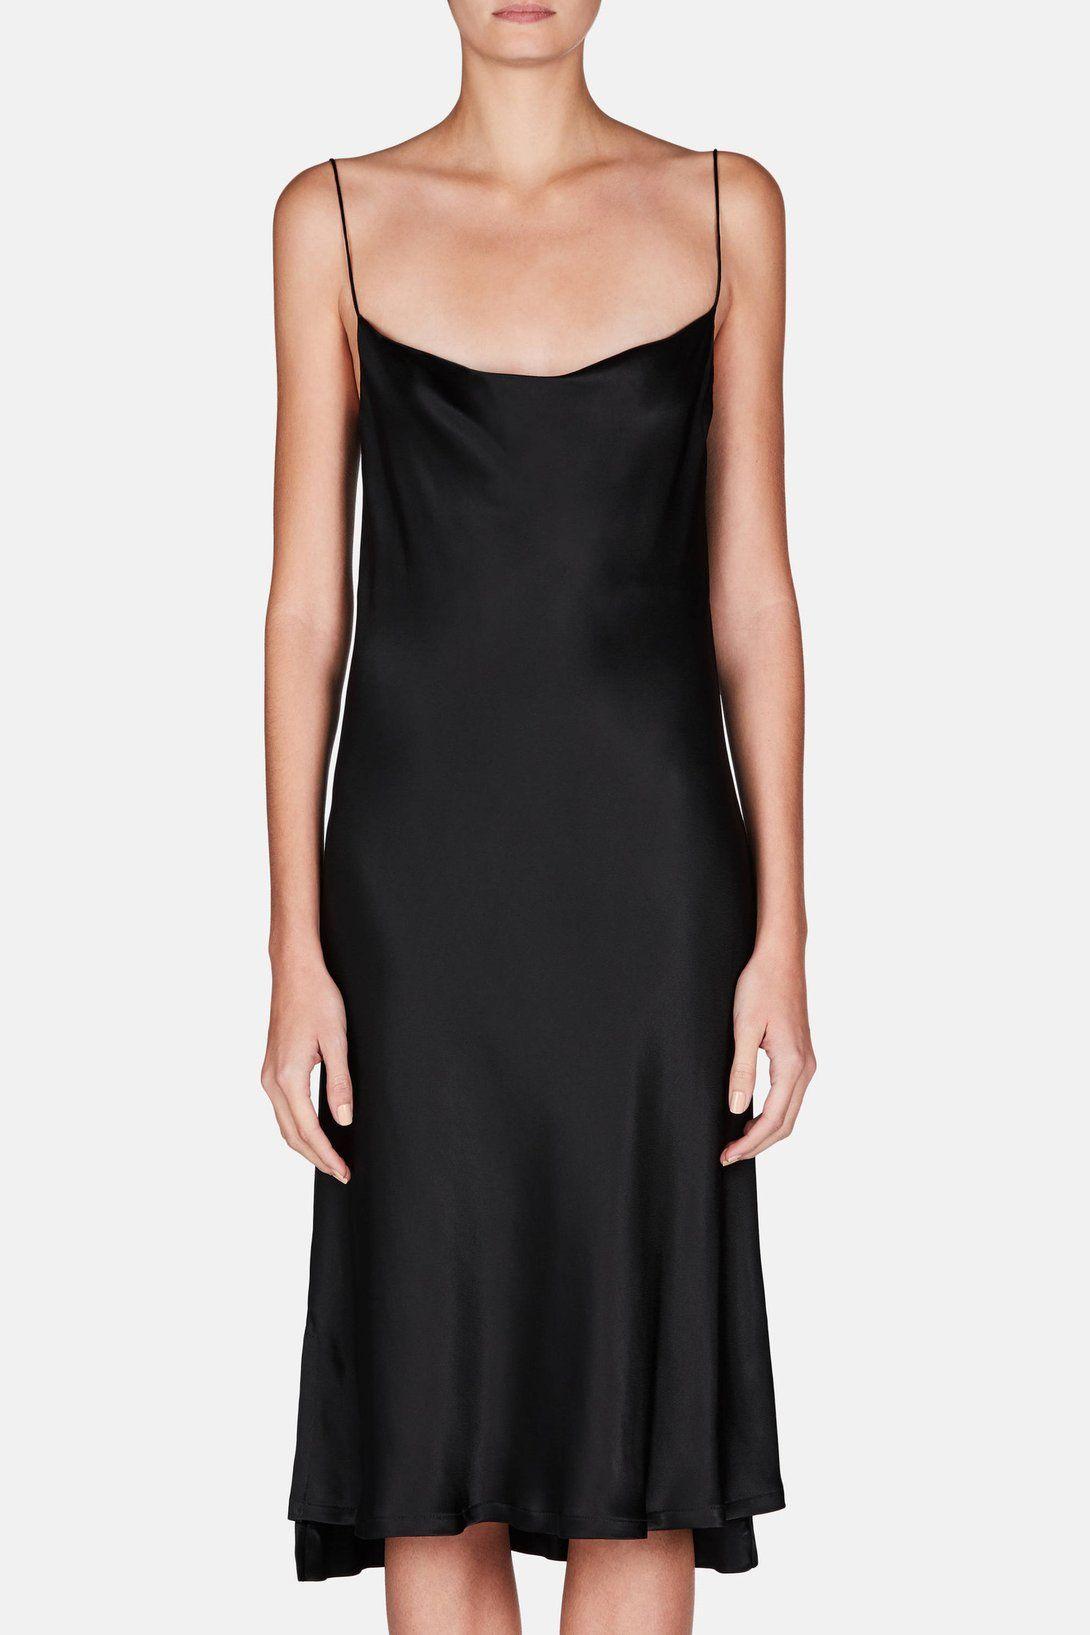 c275fee5af67 Dress 38 Draped Slip Dress - Midnight | Getting oneself dressed ...